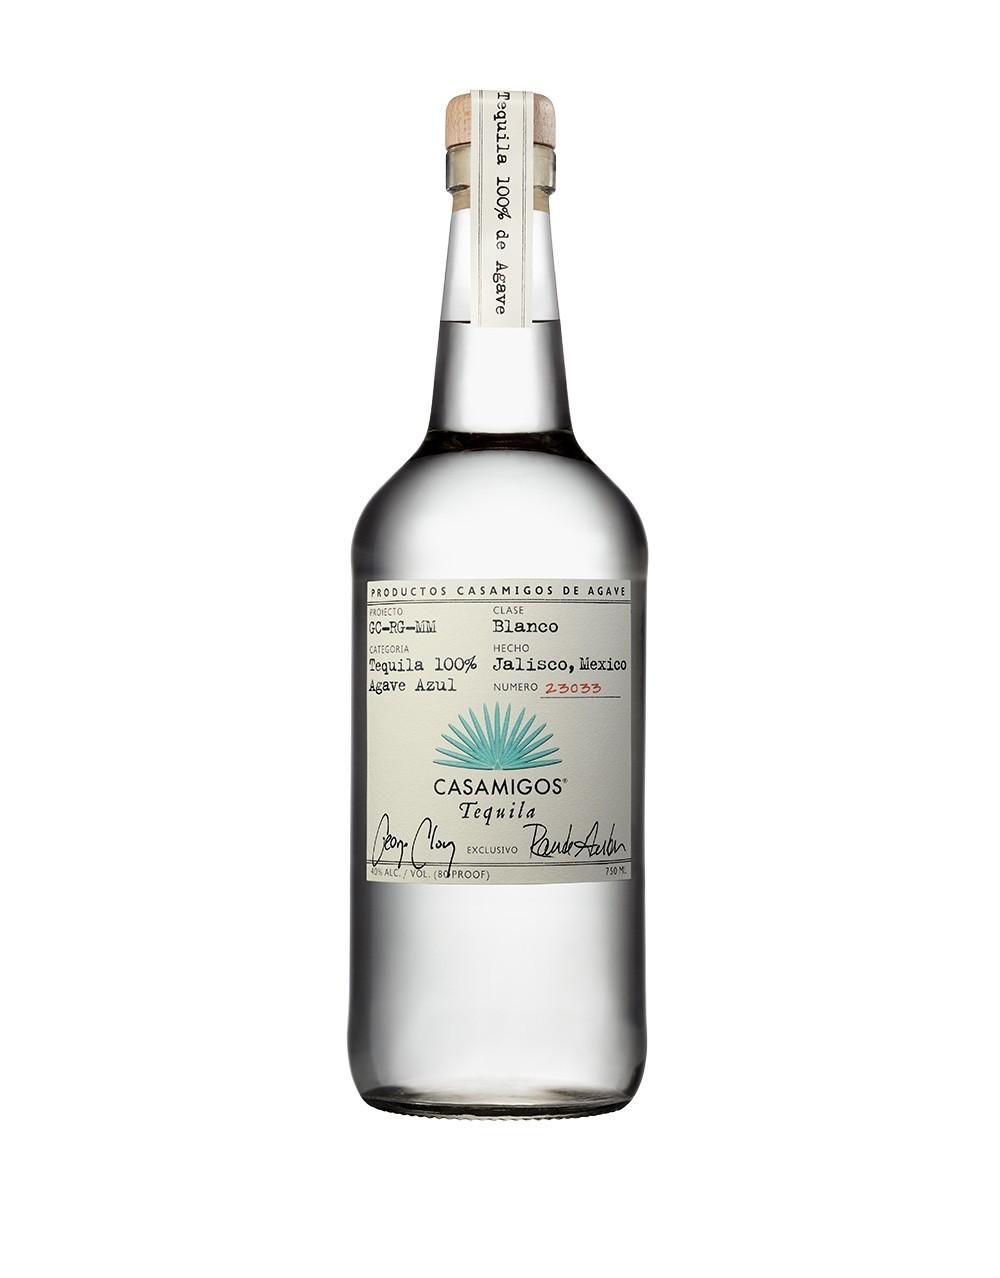 Casamigos Blanco 750ml  Buy Online or Send as a Gift  ReserveBar